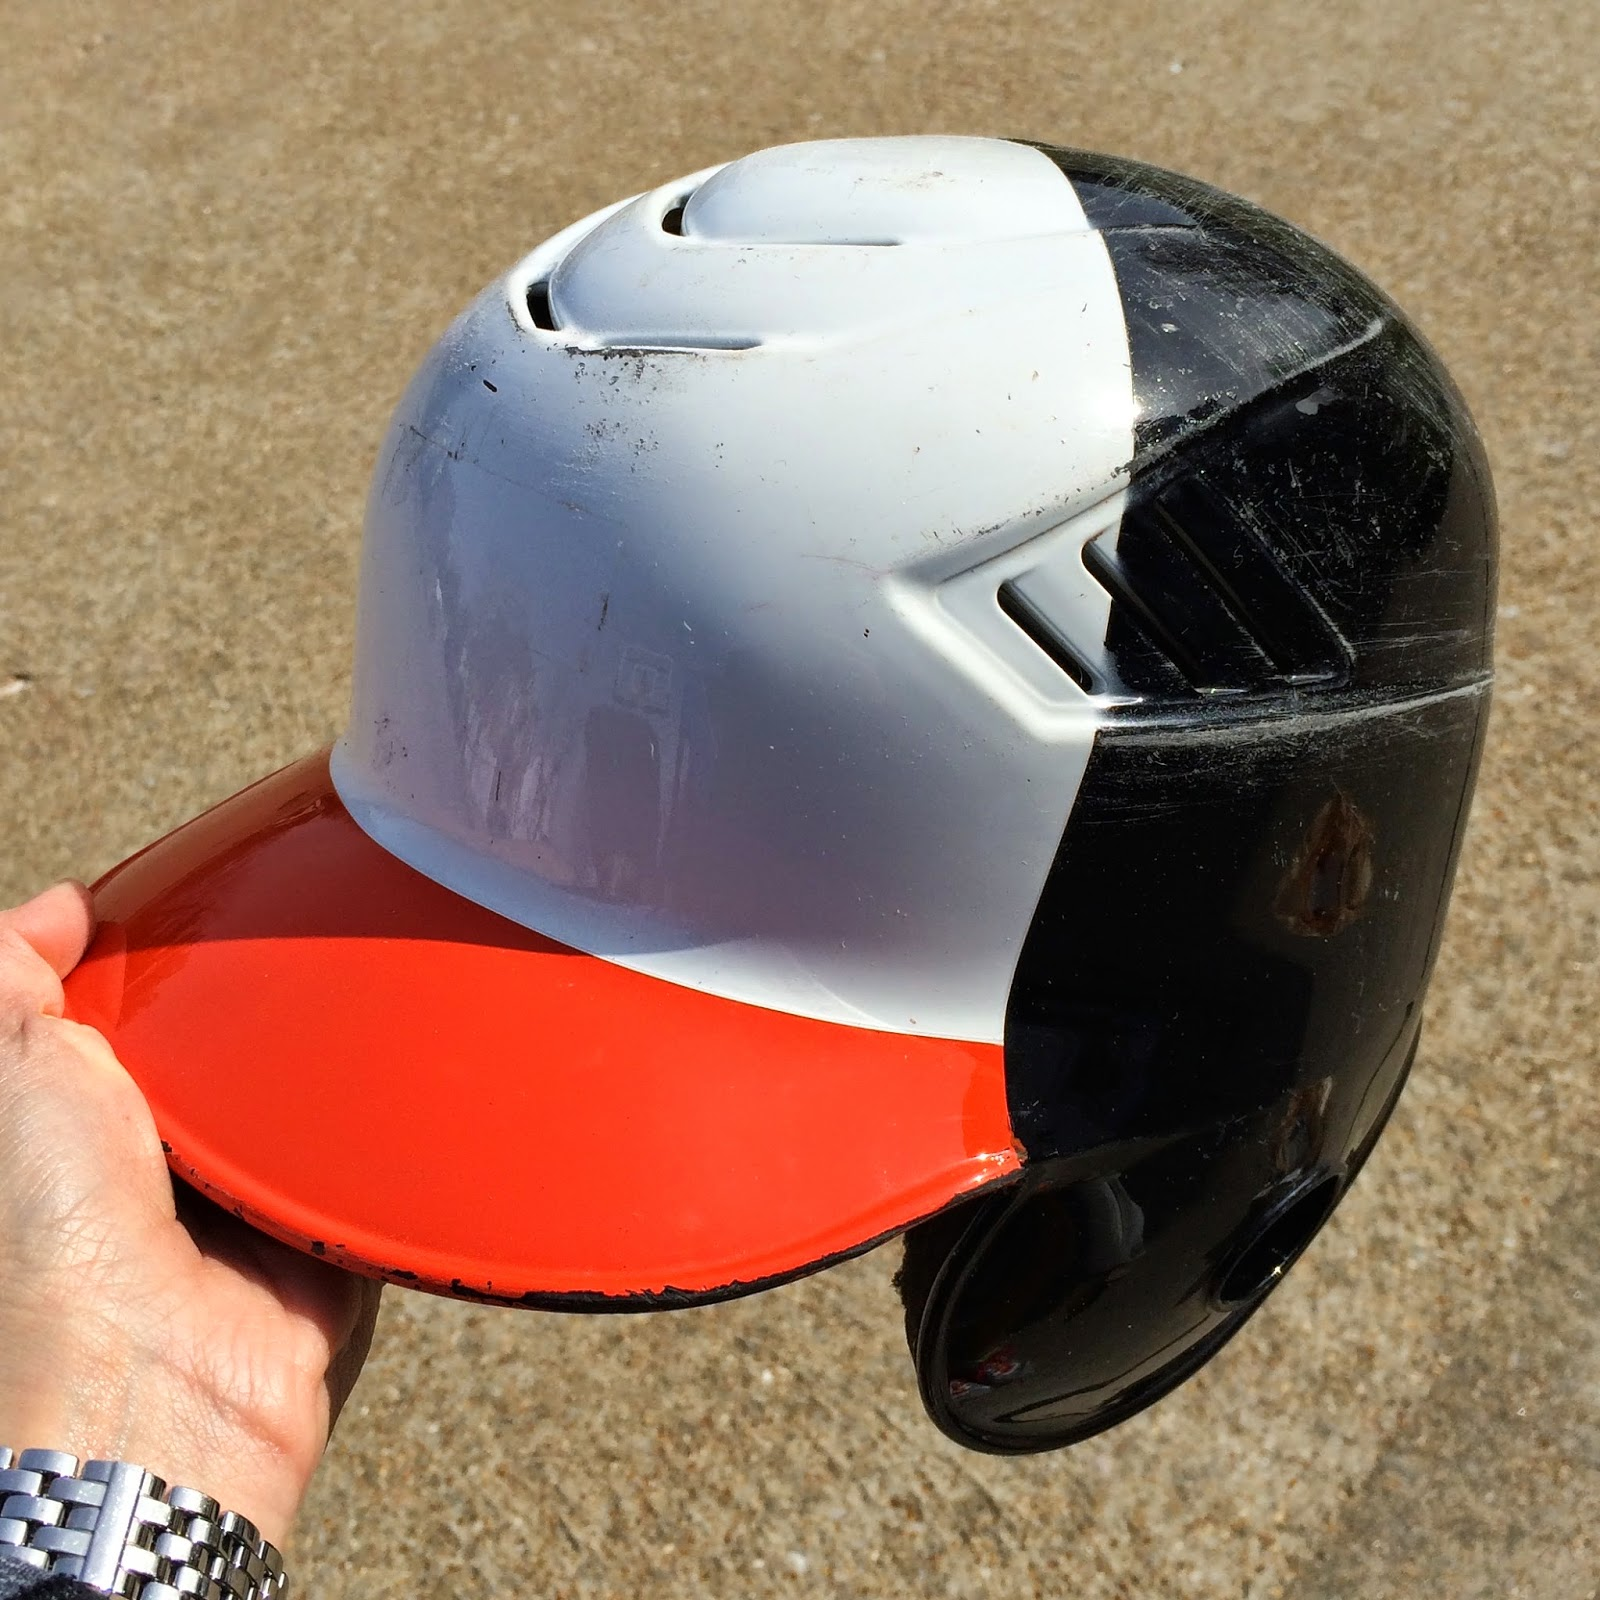 spray paint that old batting helmet charisa darling